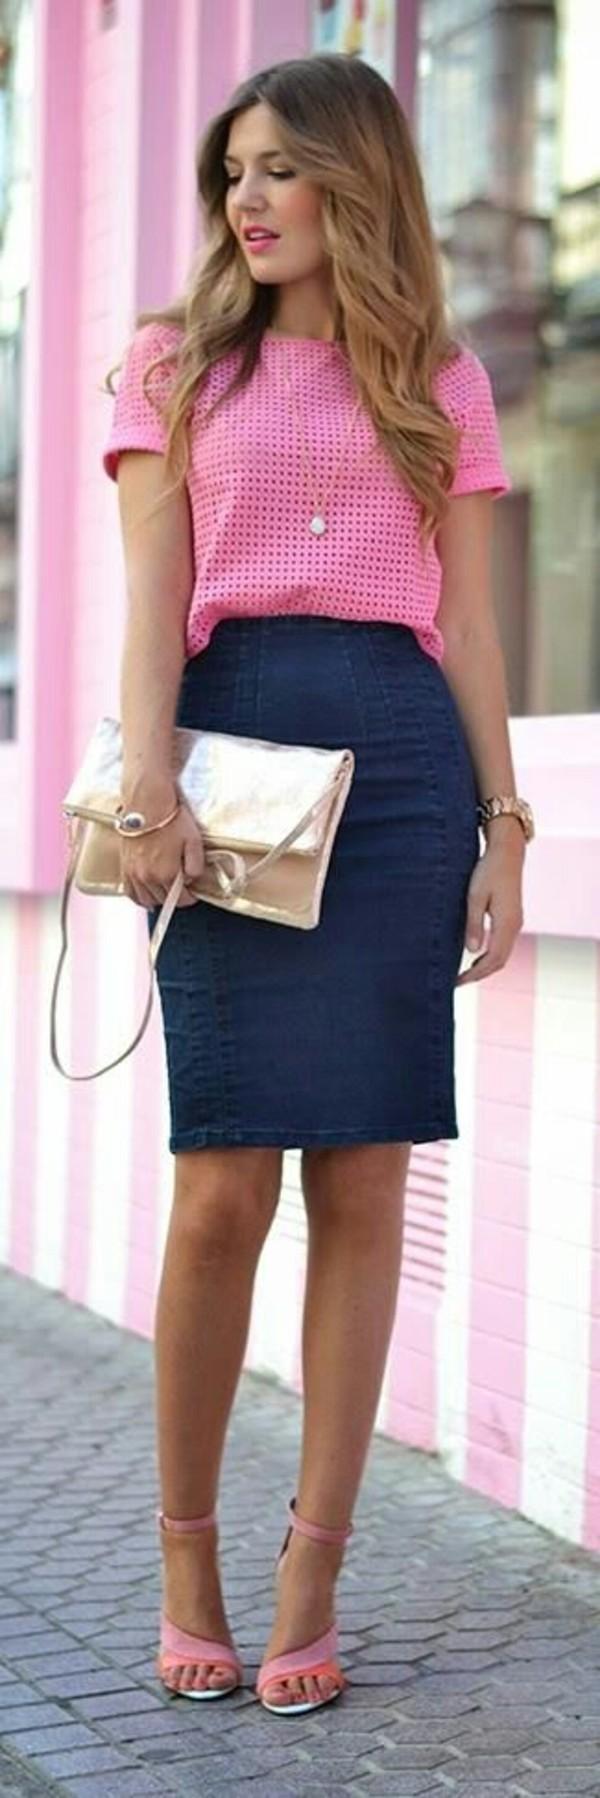 skirt denim pencil skirt blouse shoes office outfits blue skirt top pink top checkered bag gold bag sandals pink sandal